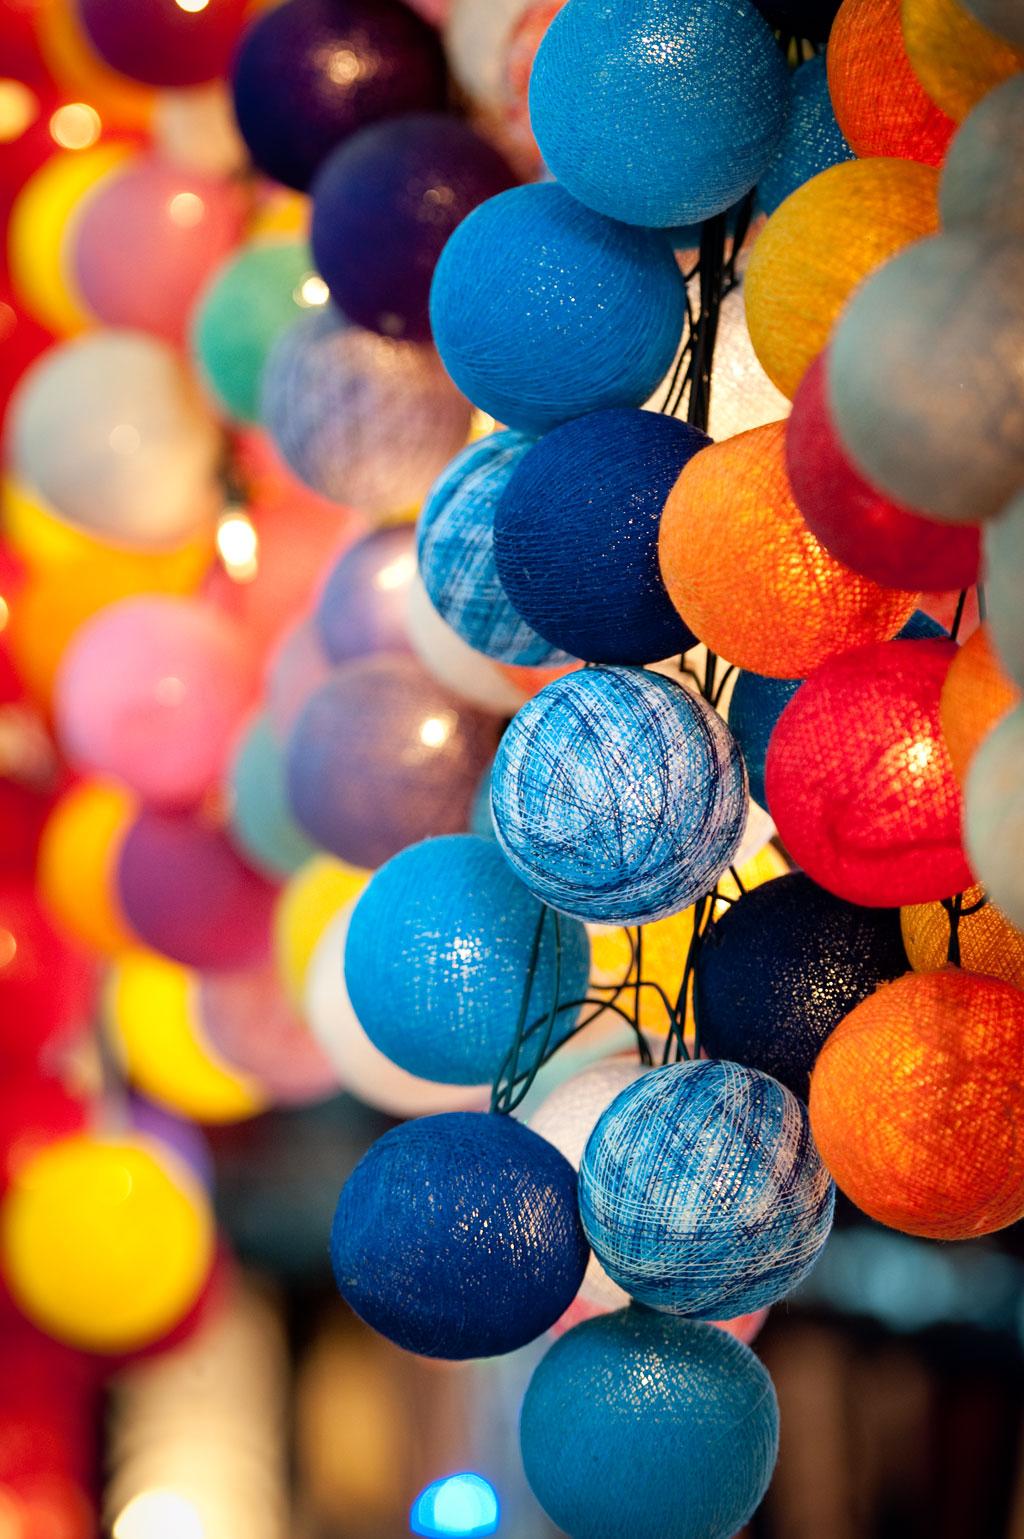 Colorful Lights I